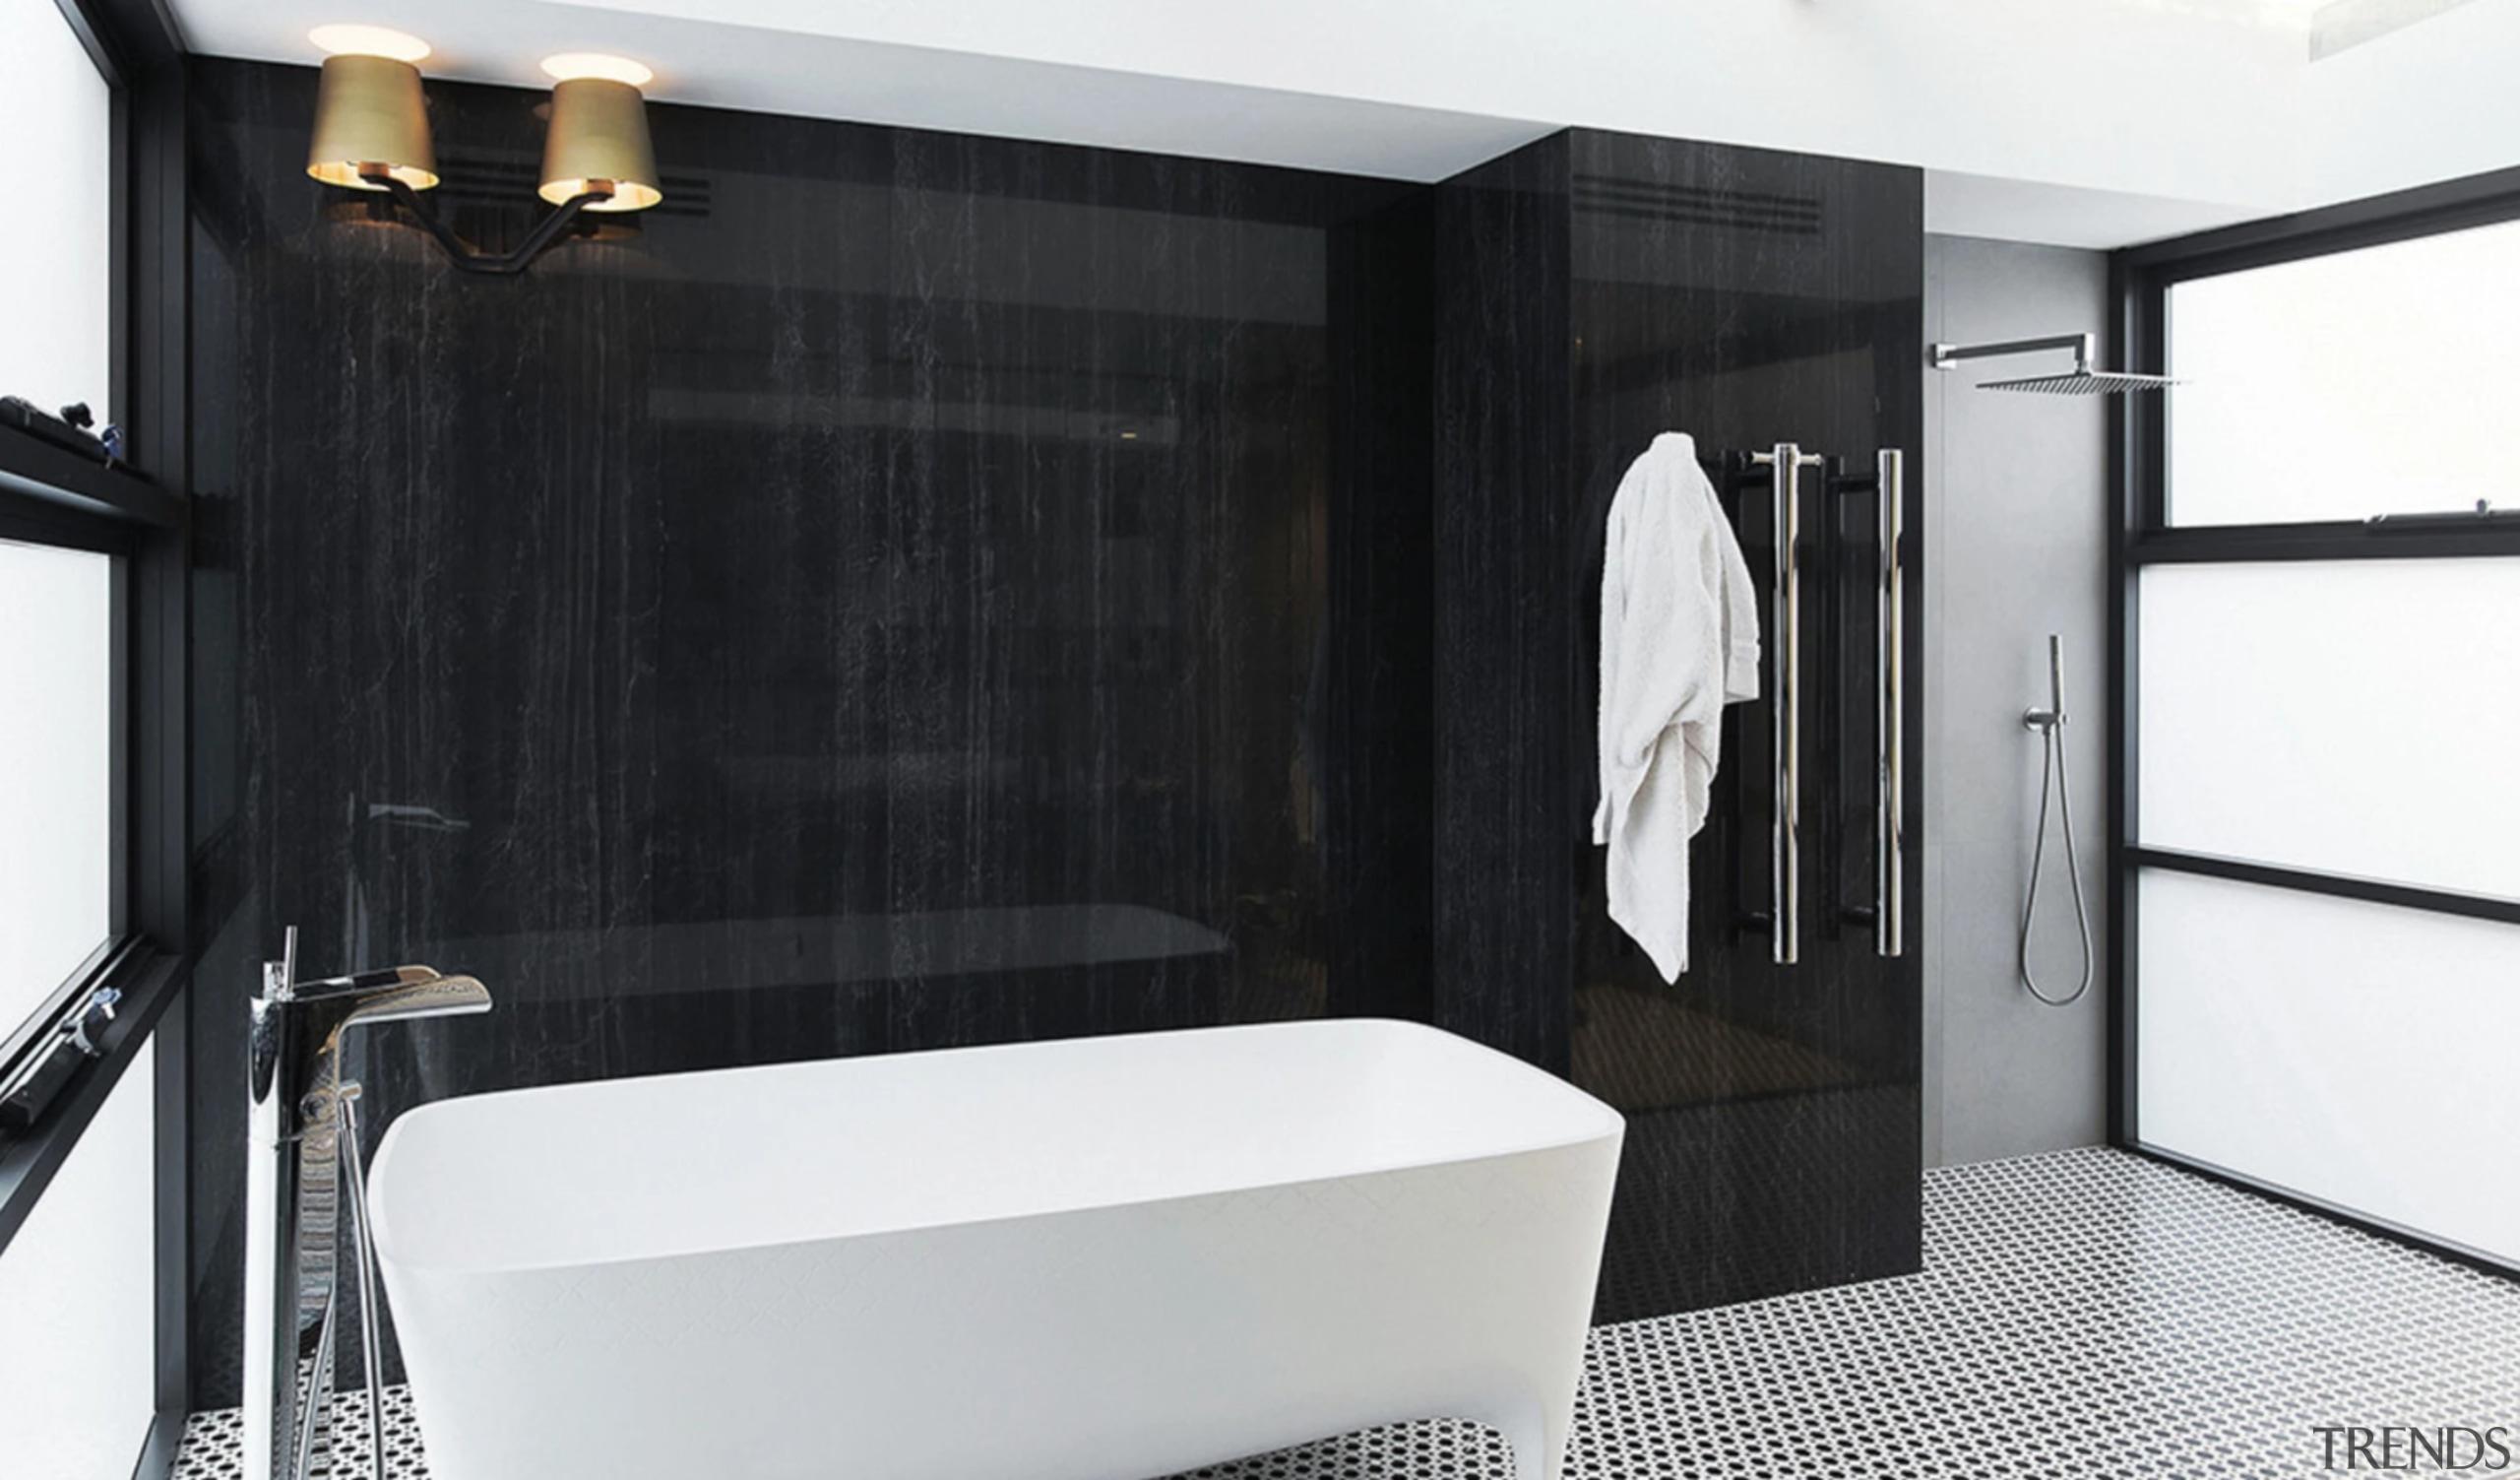 Ceramic, marble and stone tiles are stylish floor bathroom, bathroom cabinet, bathtub, black-and-white, building, door, floor, furniture, interior design, plumbing fixture, property, room, suite, tap, tile, black, white